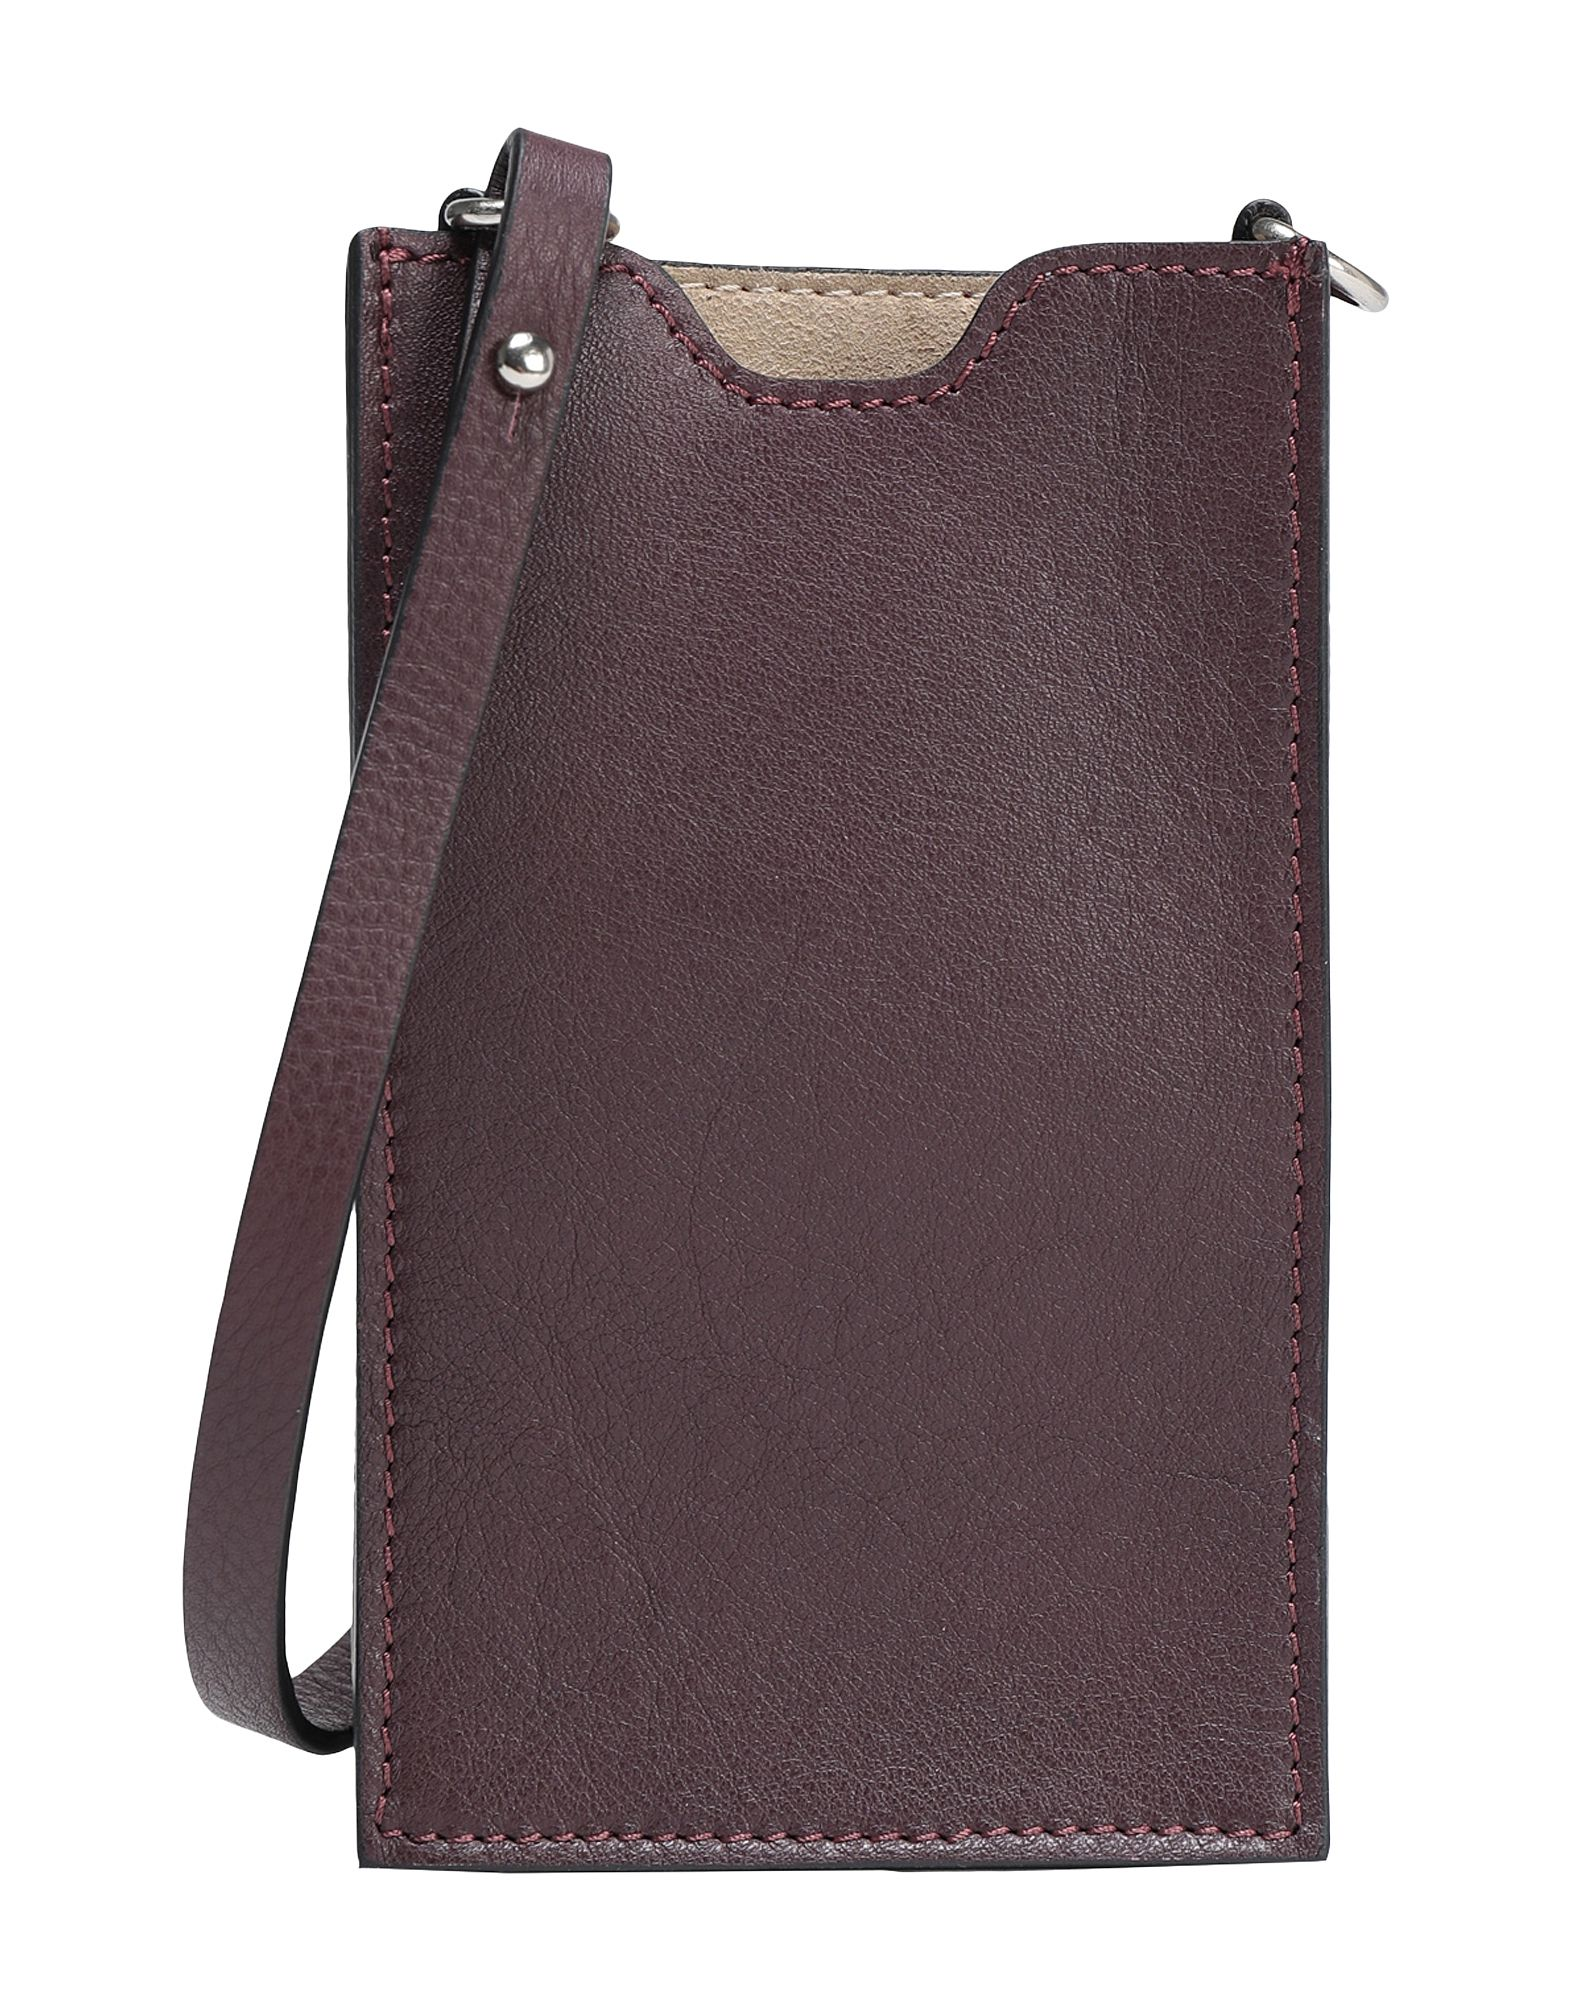 8 by YOOX Сумка через плечо 8 by yoox сумка на плечо